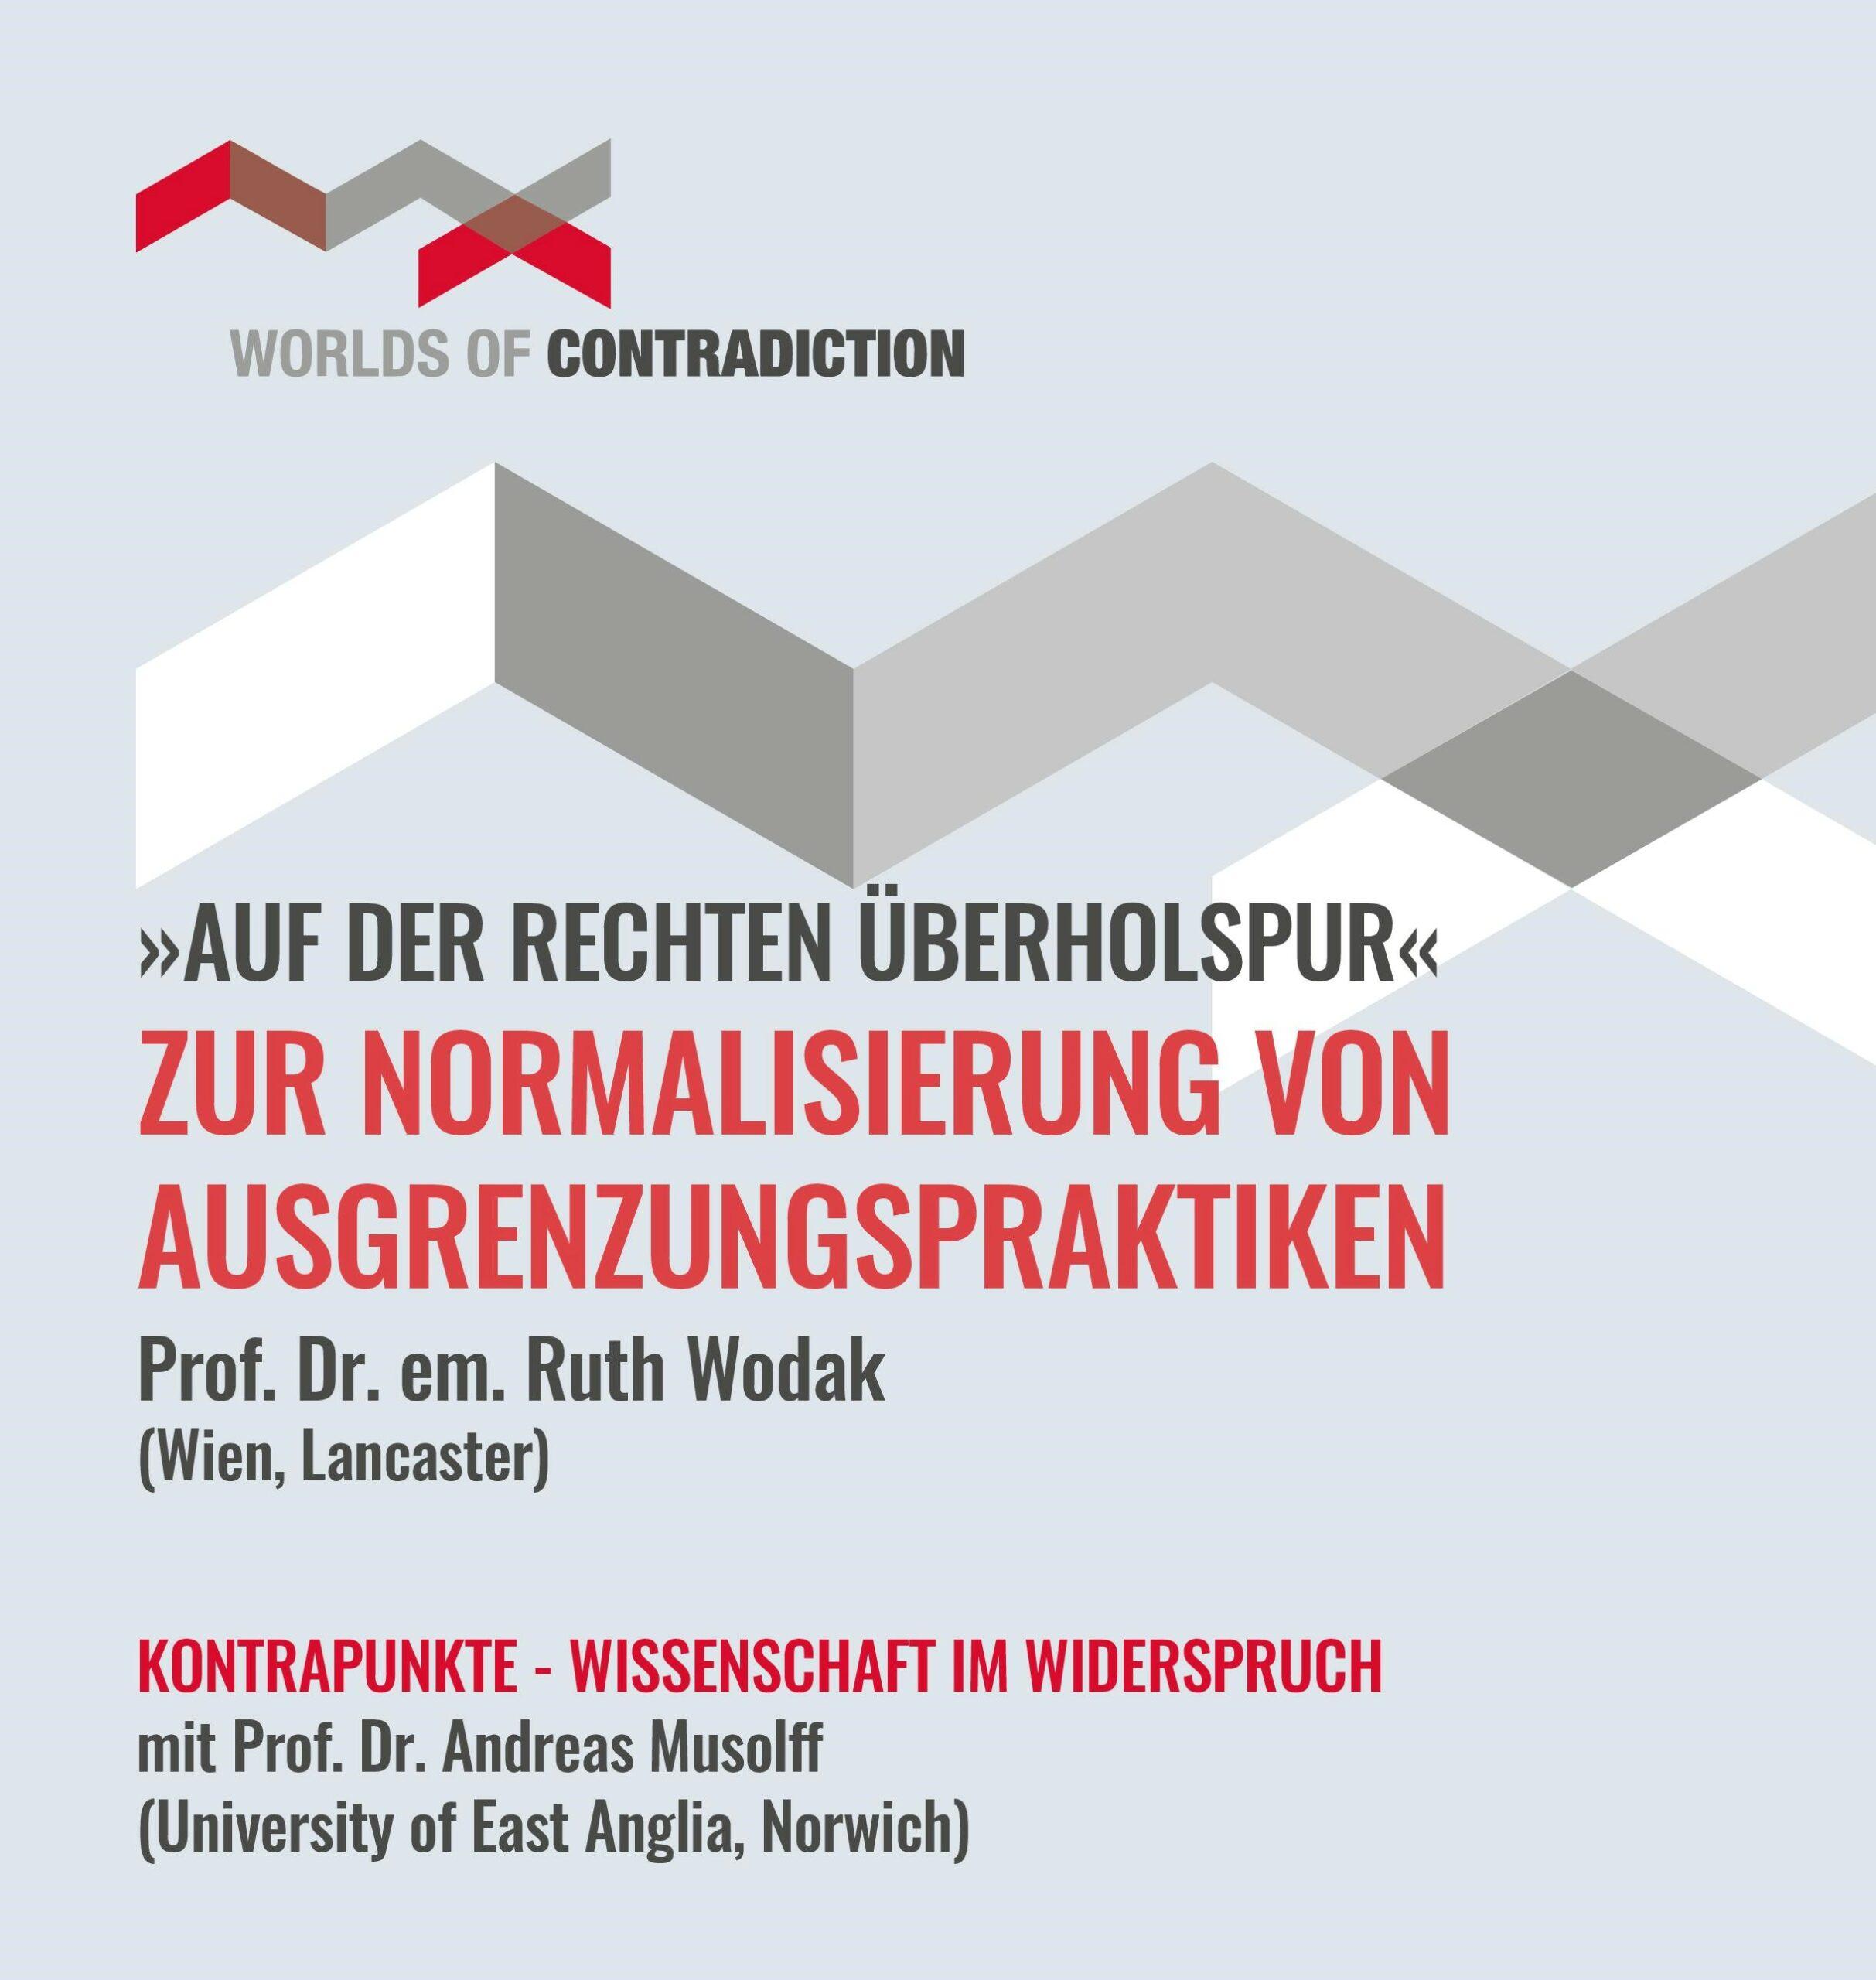 WoC_Kontrapunkte_Plakat_Web_Wodak_cropped